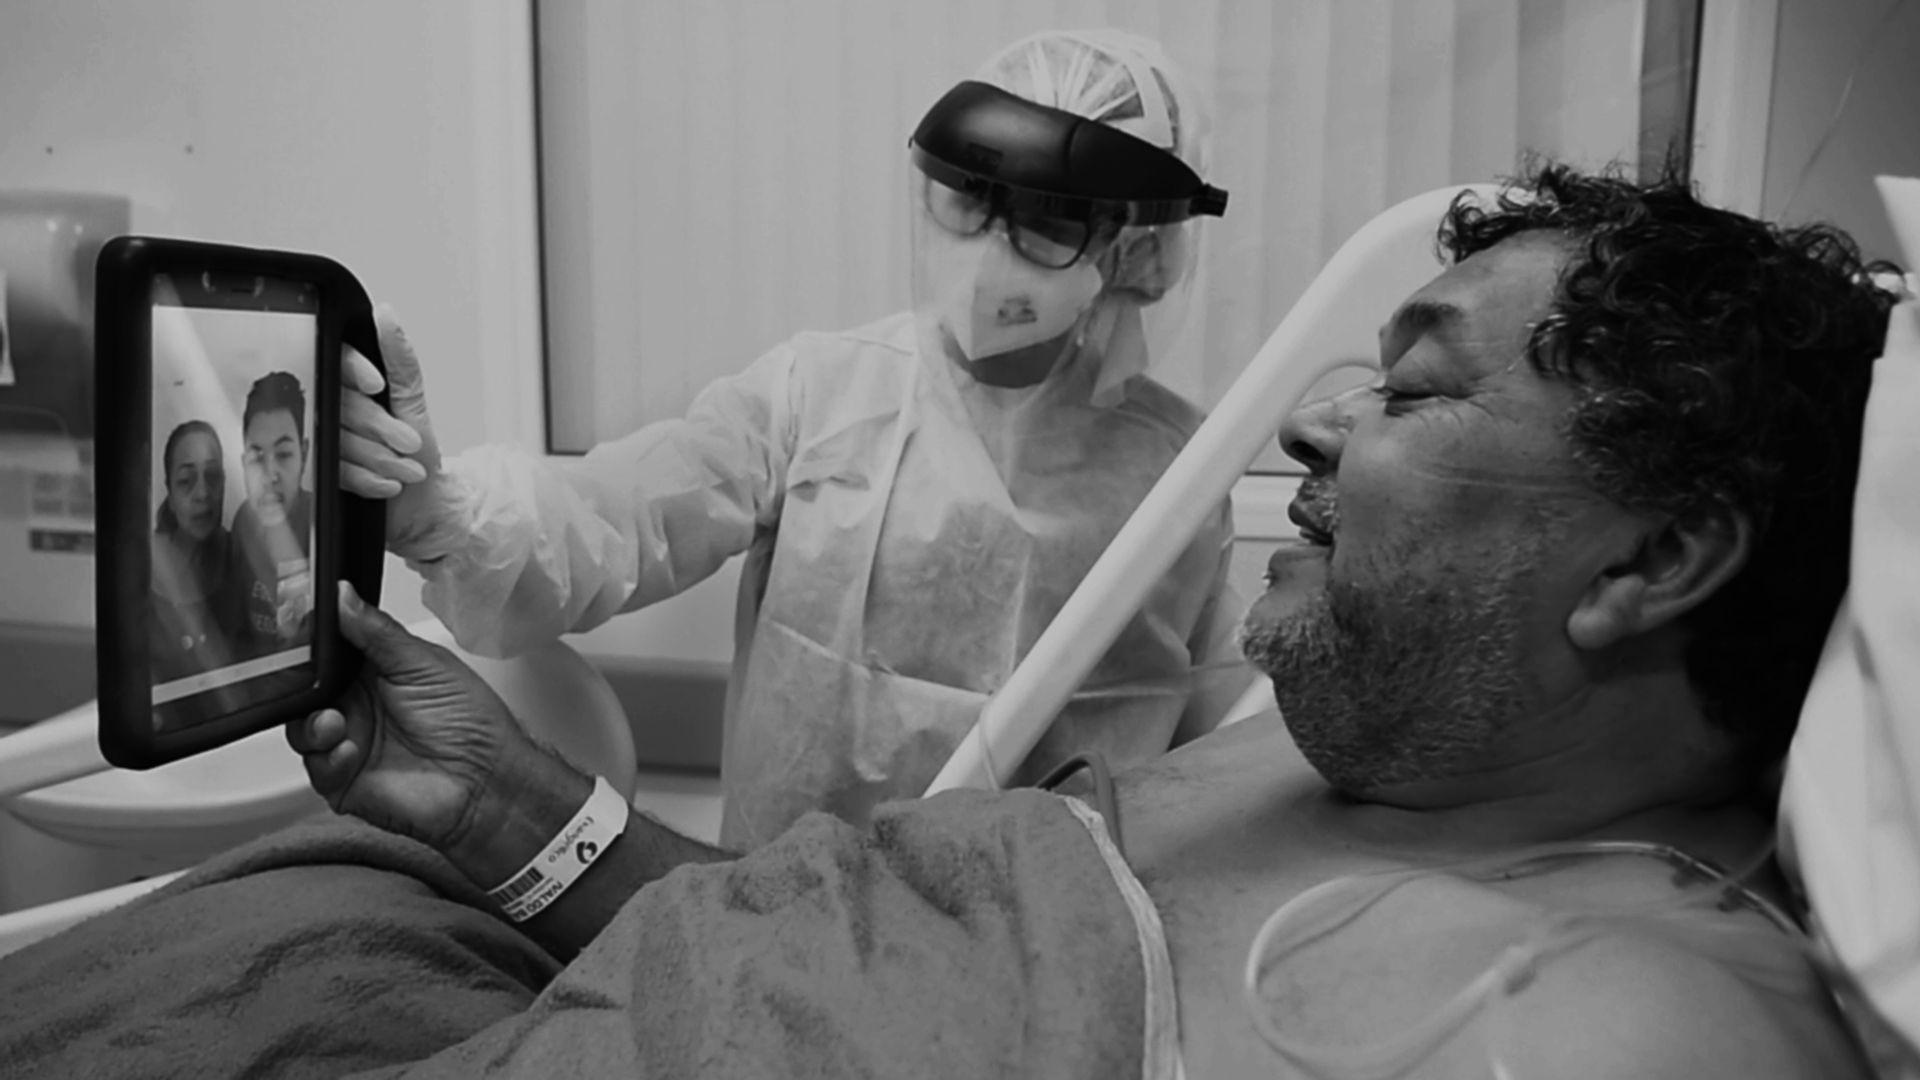 O seu Ilvaldo Balbino da Silva durante a Visita Virtual. Na foto, a reportagem acompanha o bate-papo